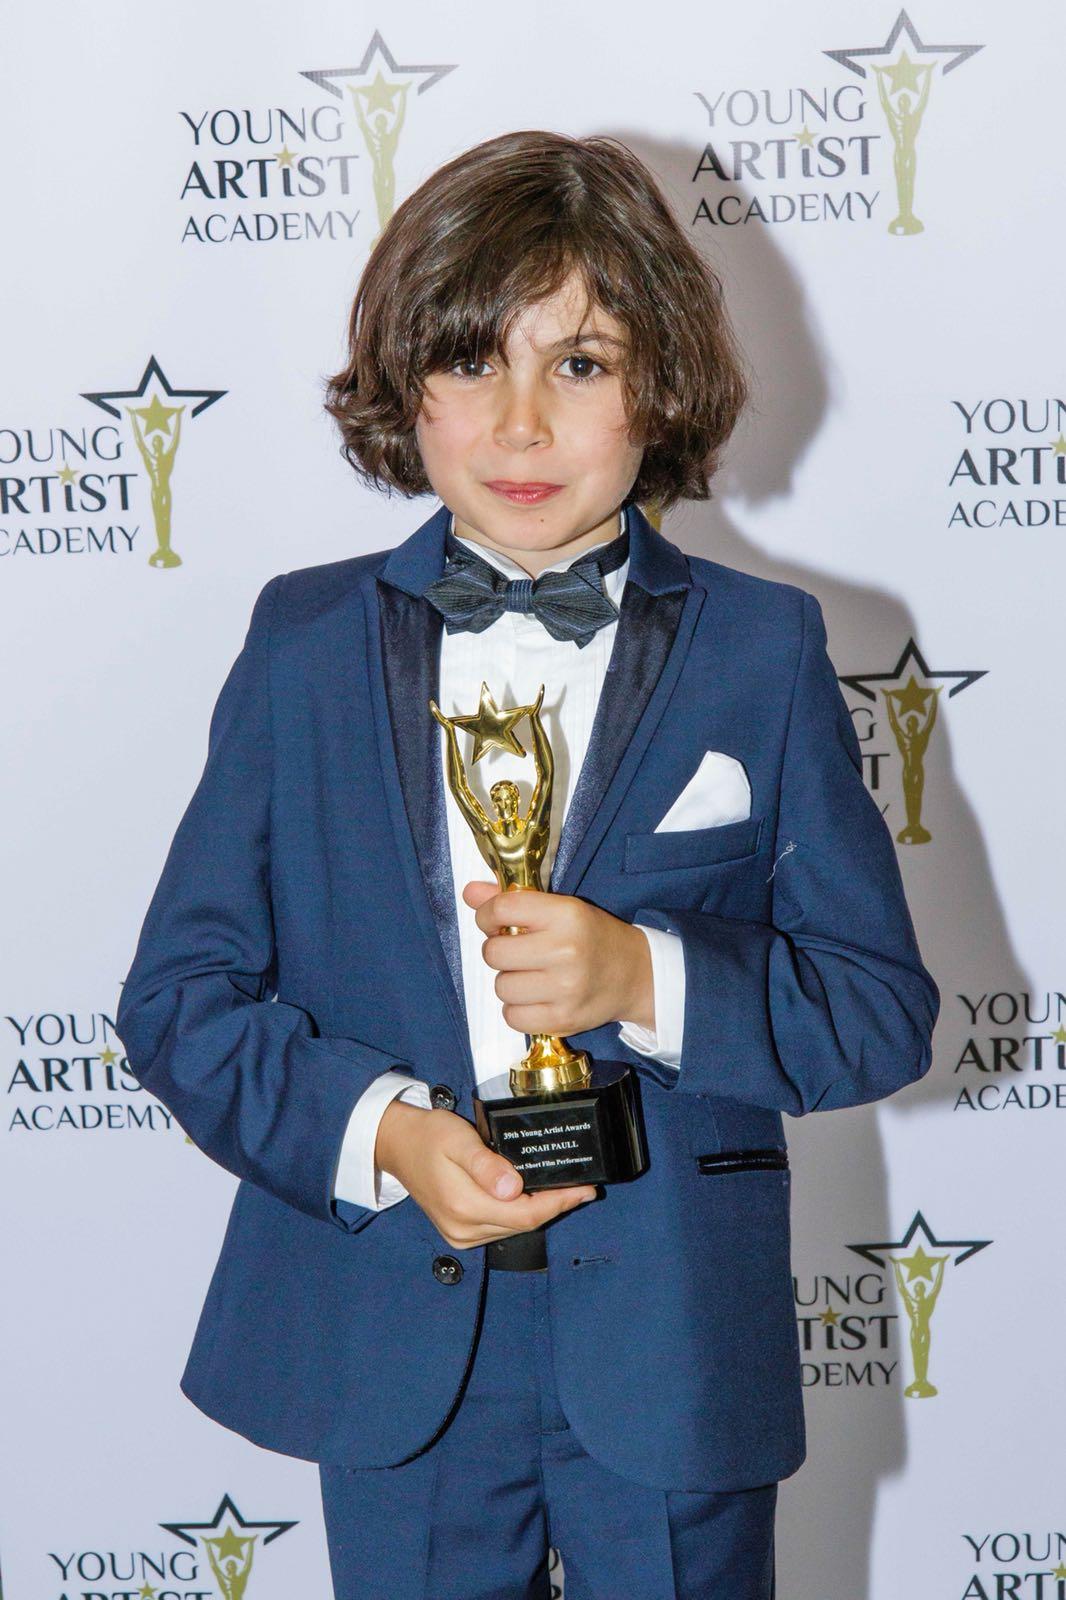 Jonah Paull with the Award